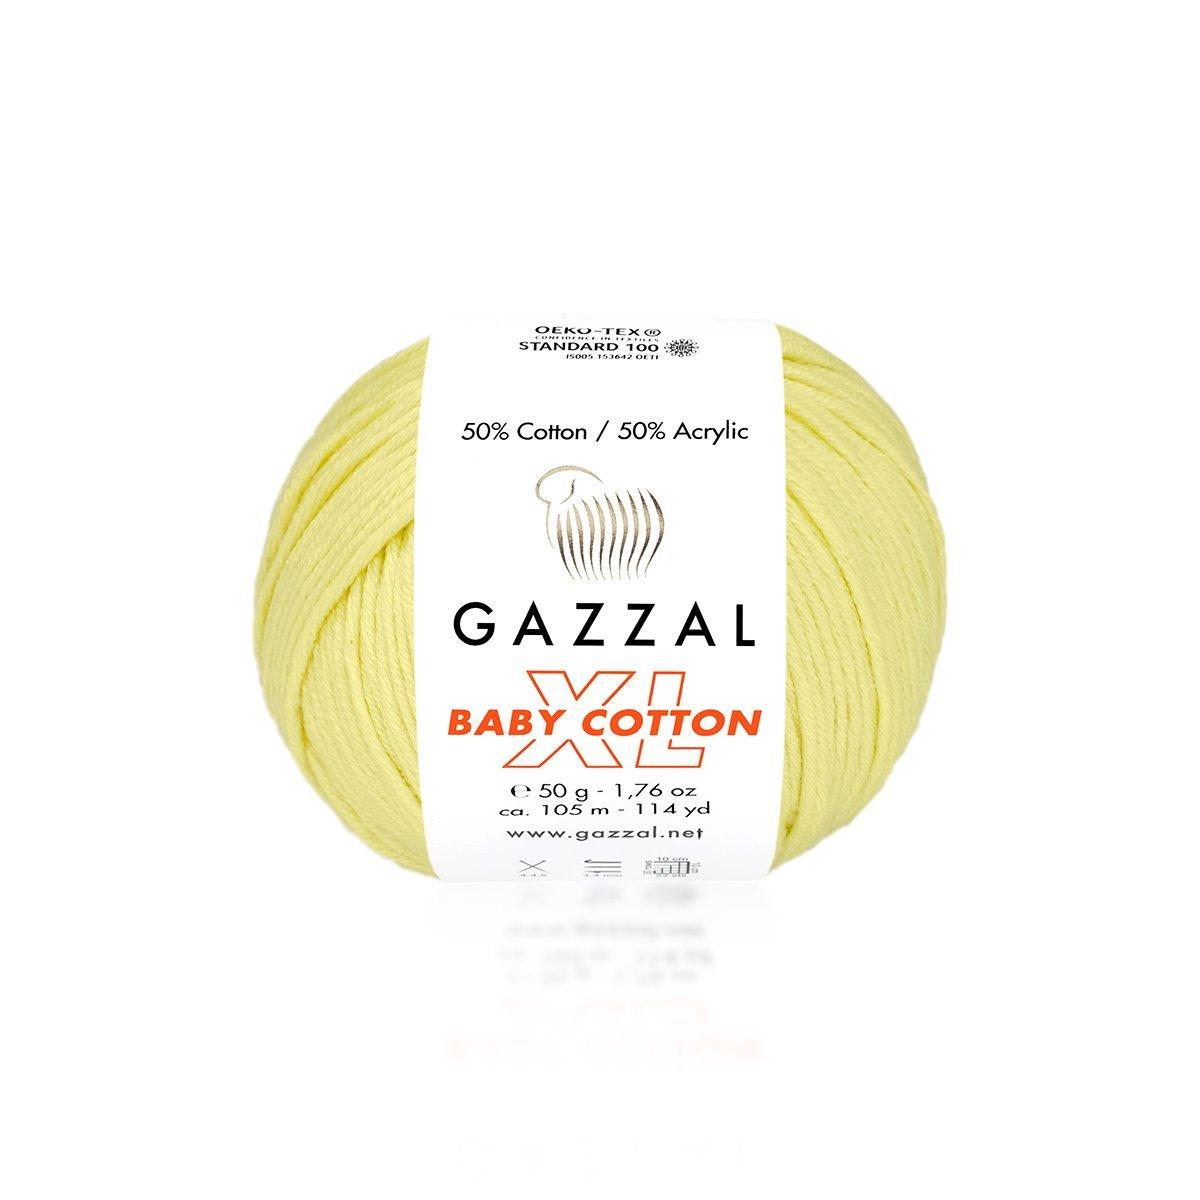 Пряжа Gazzal Baby Cotton XL 3413 светло-желтый